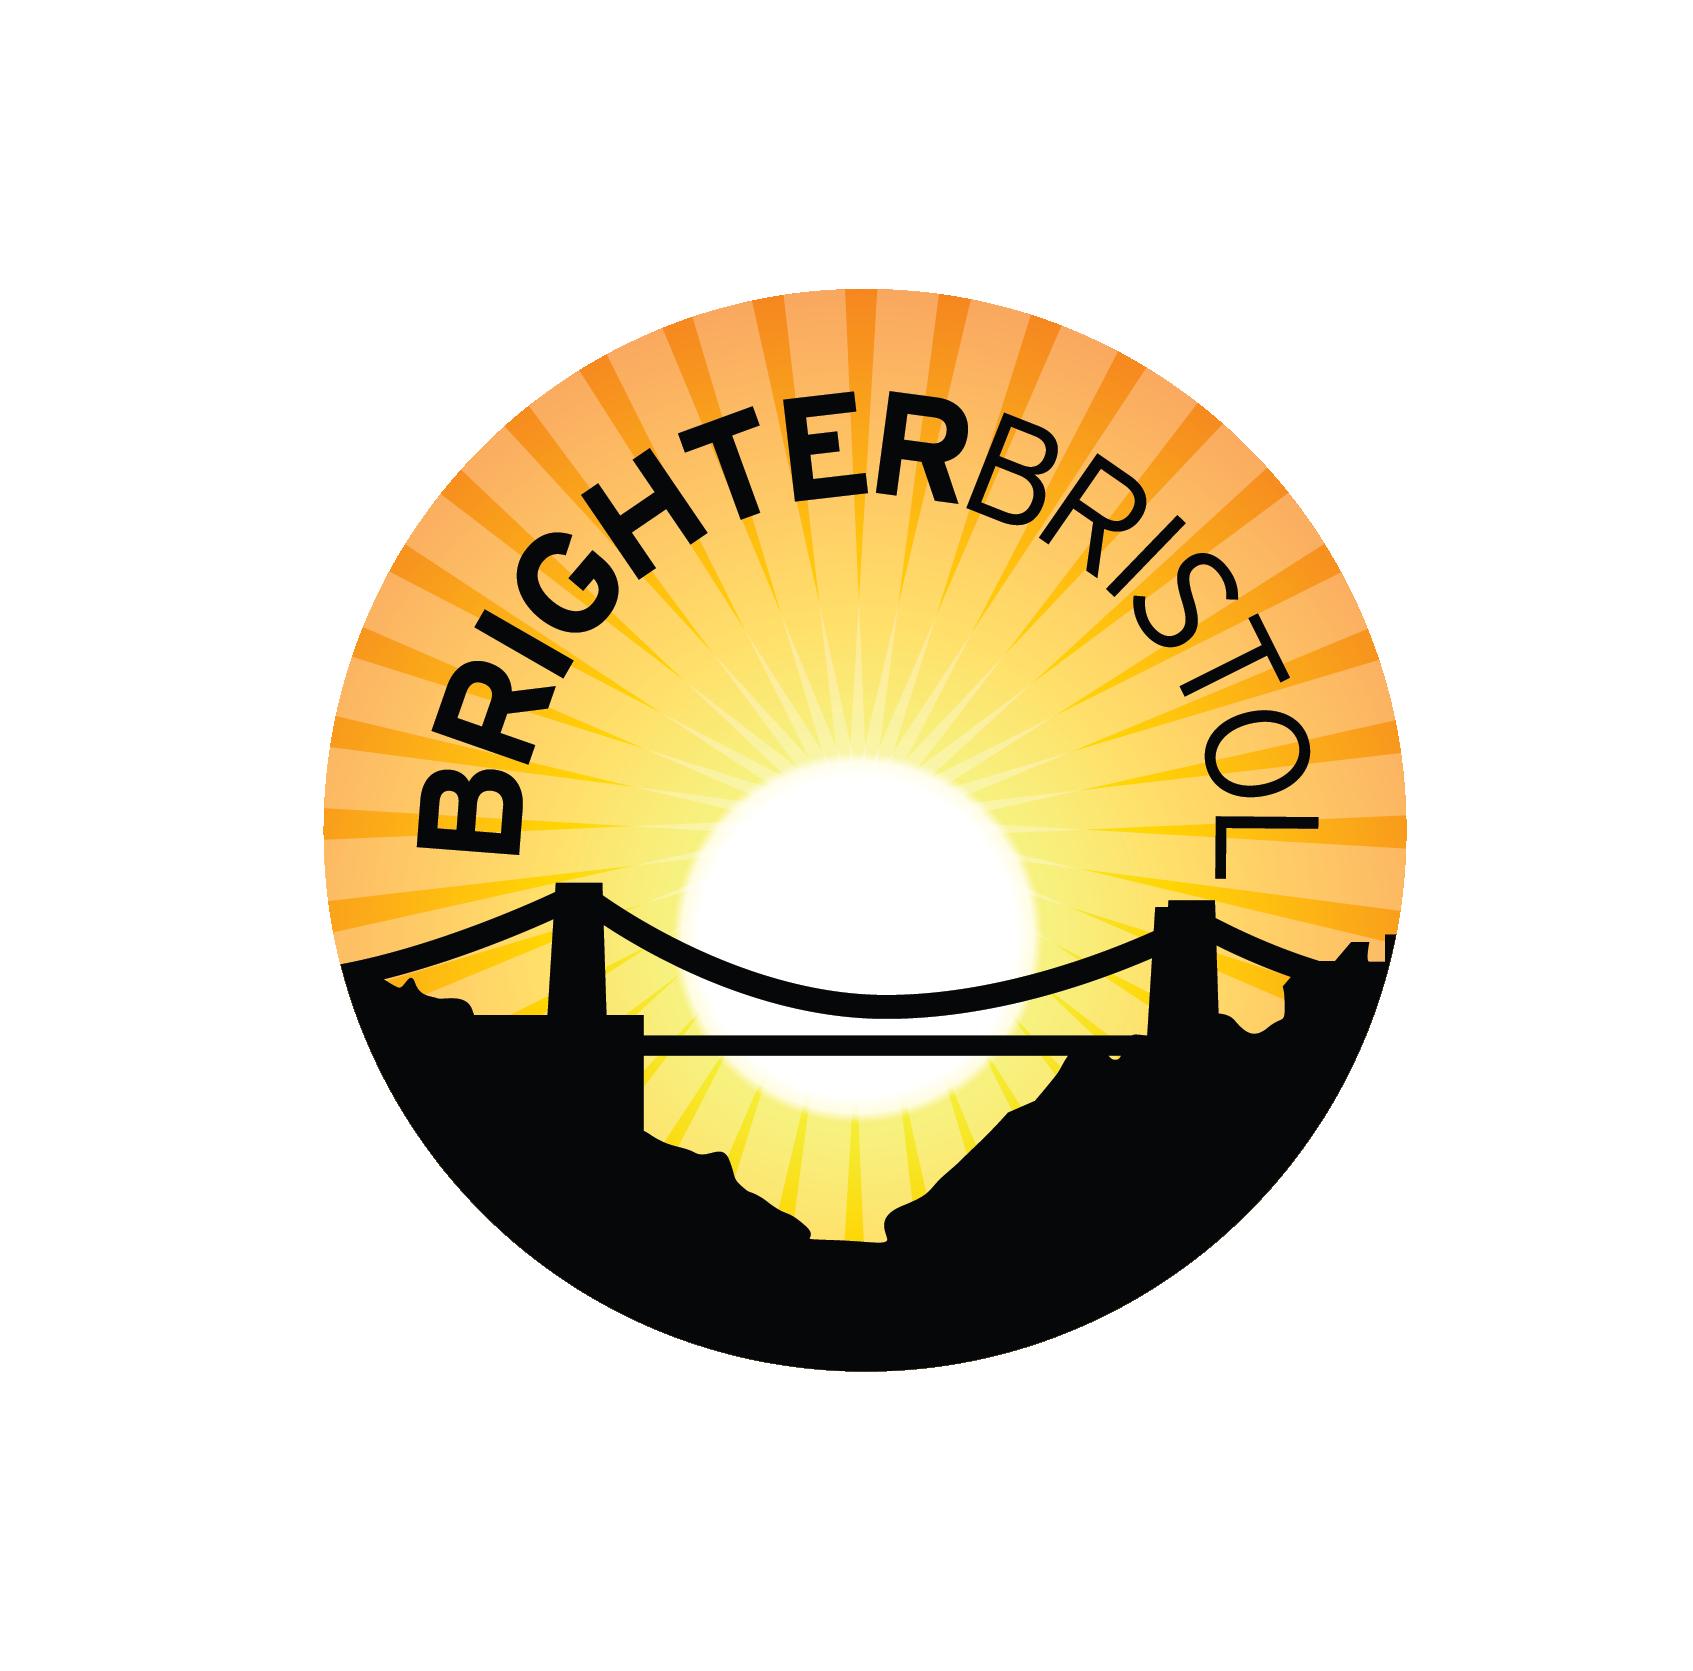 Brighter bristol.png